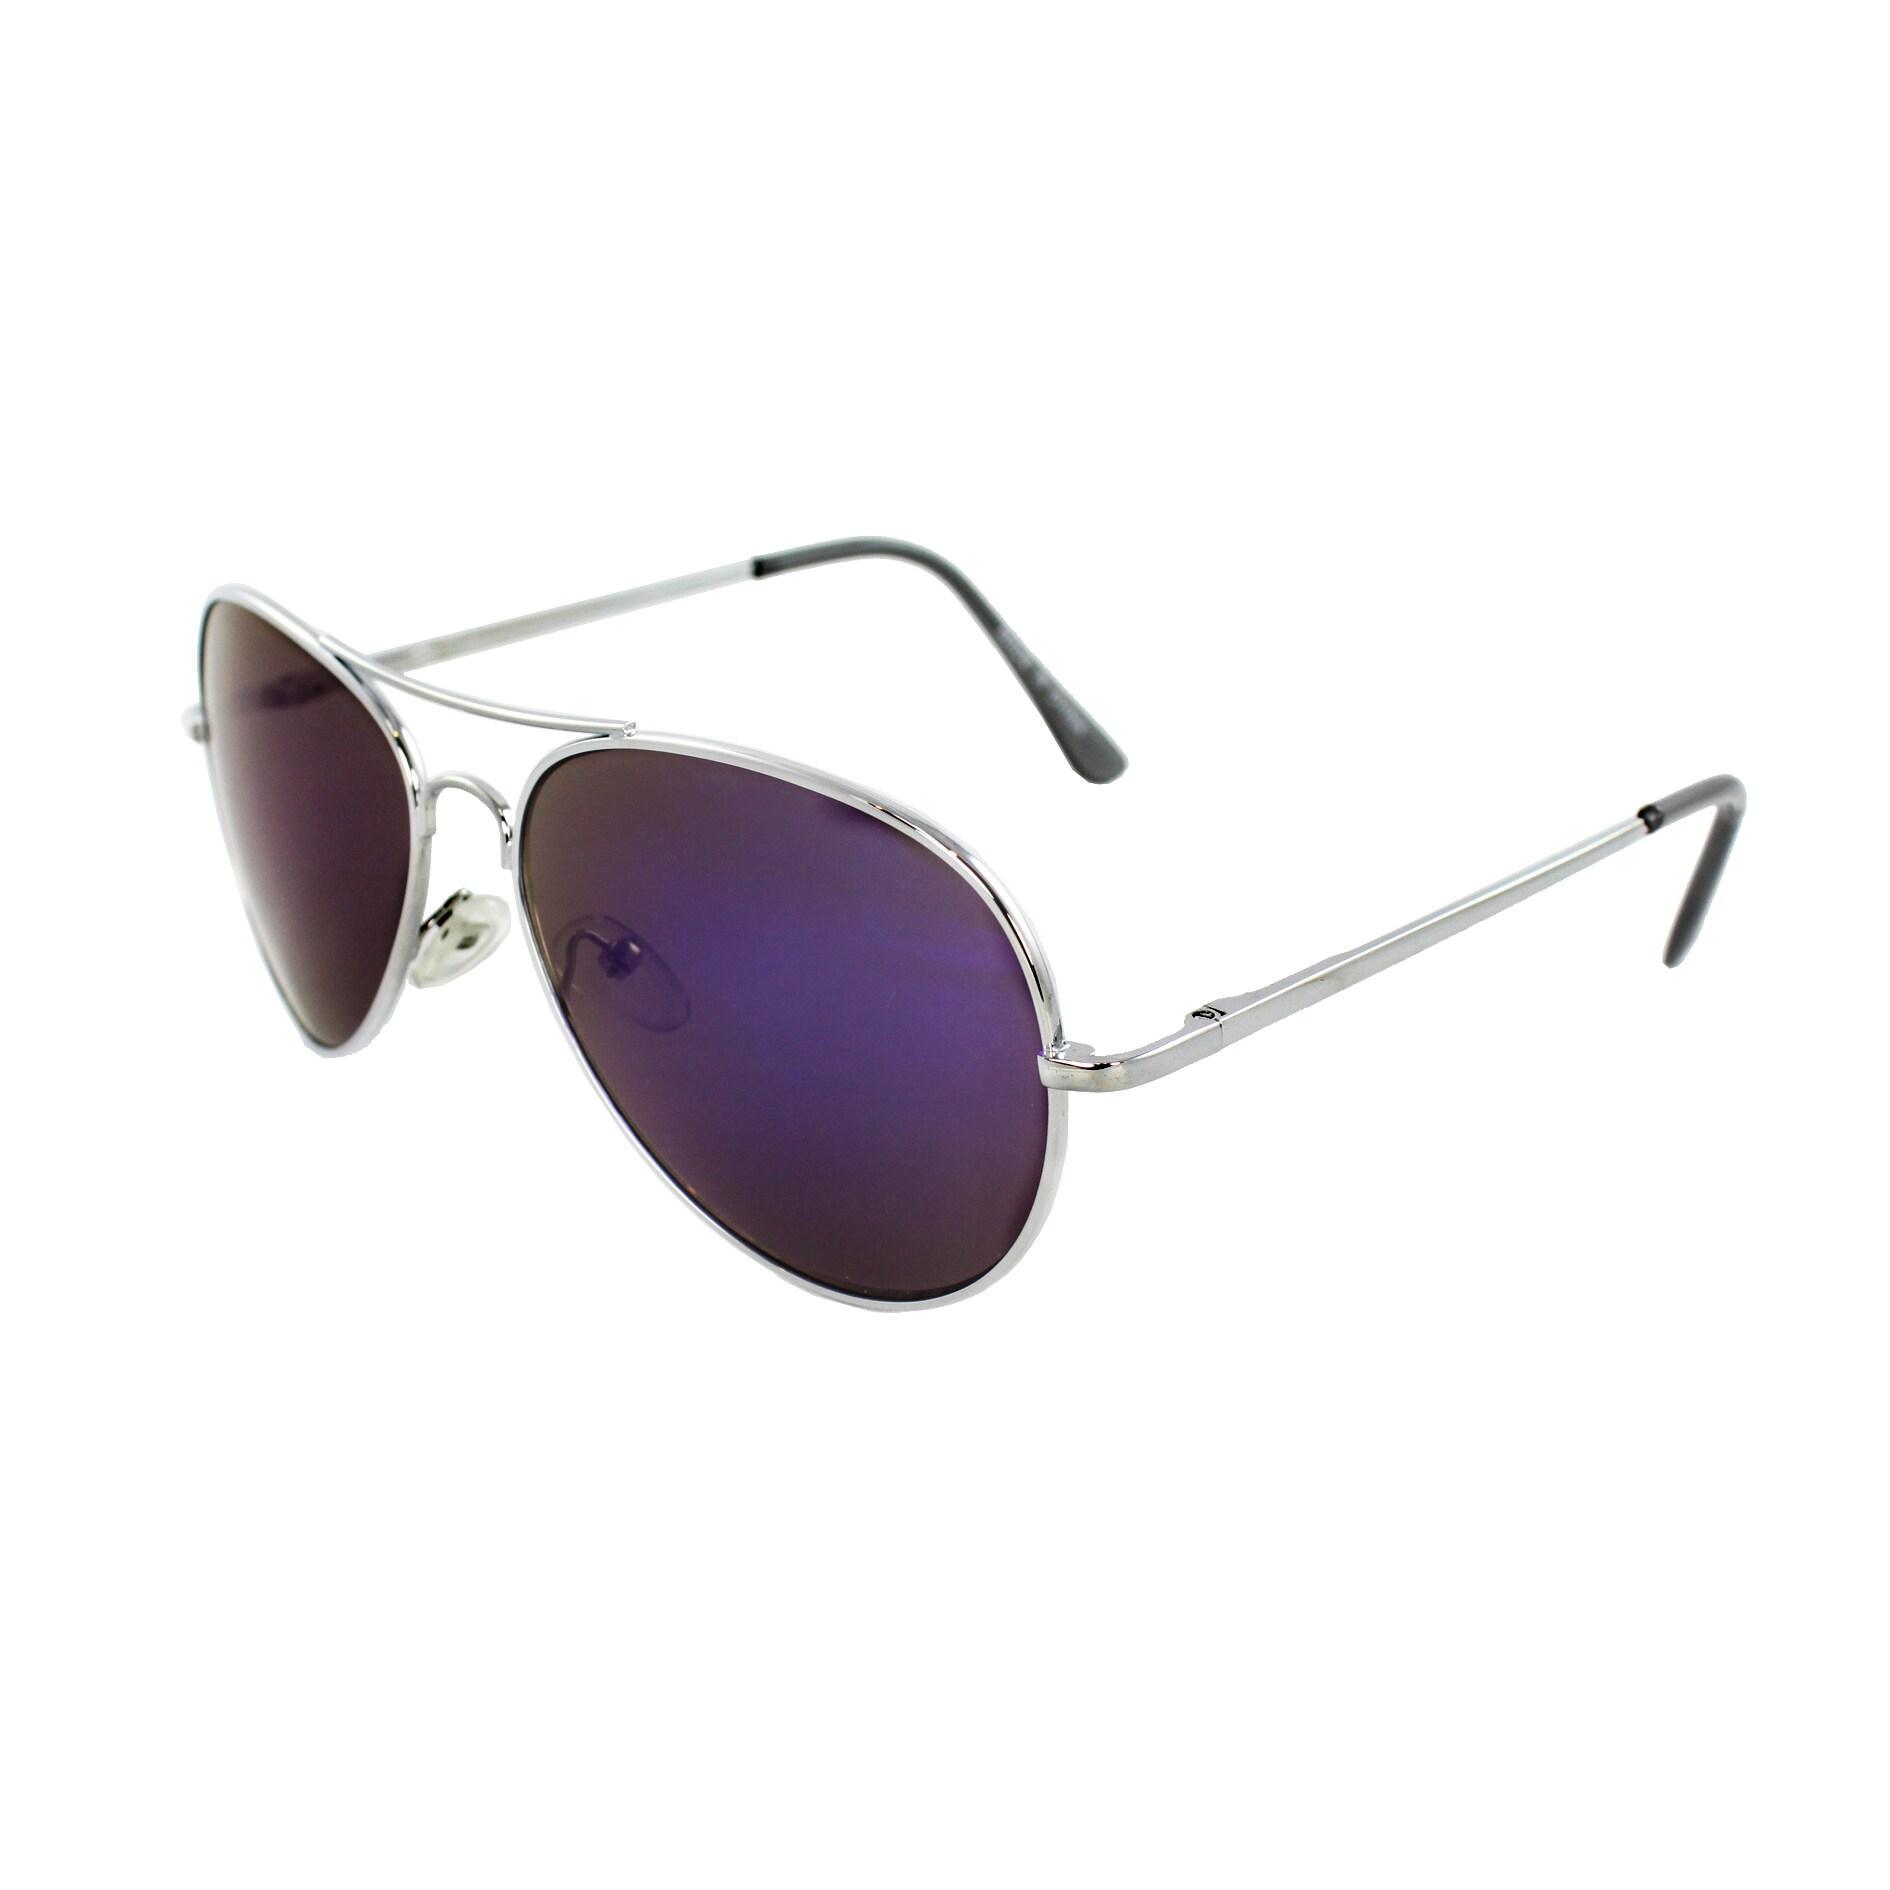 Unisex 30011R-SVRPL Metal/ Purple Mirror Aviator Sunglasses